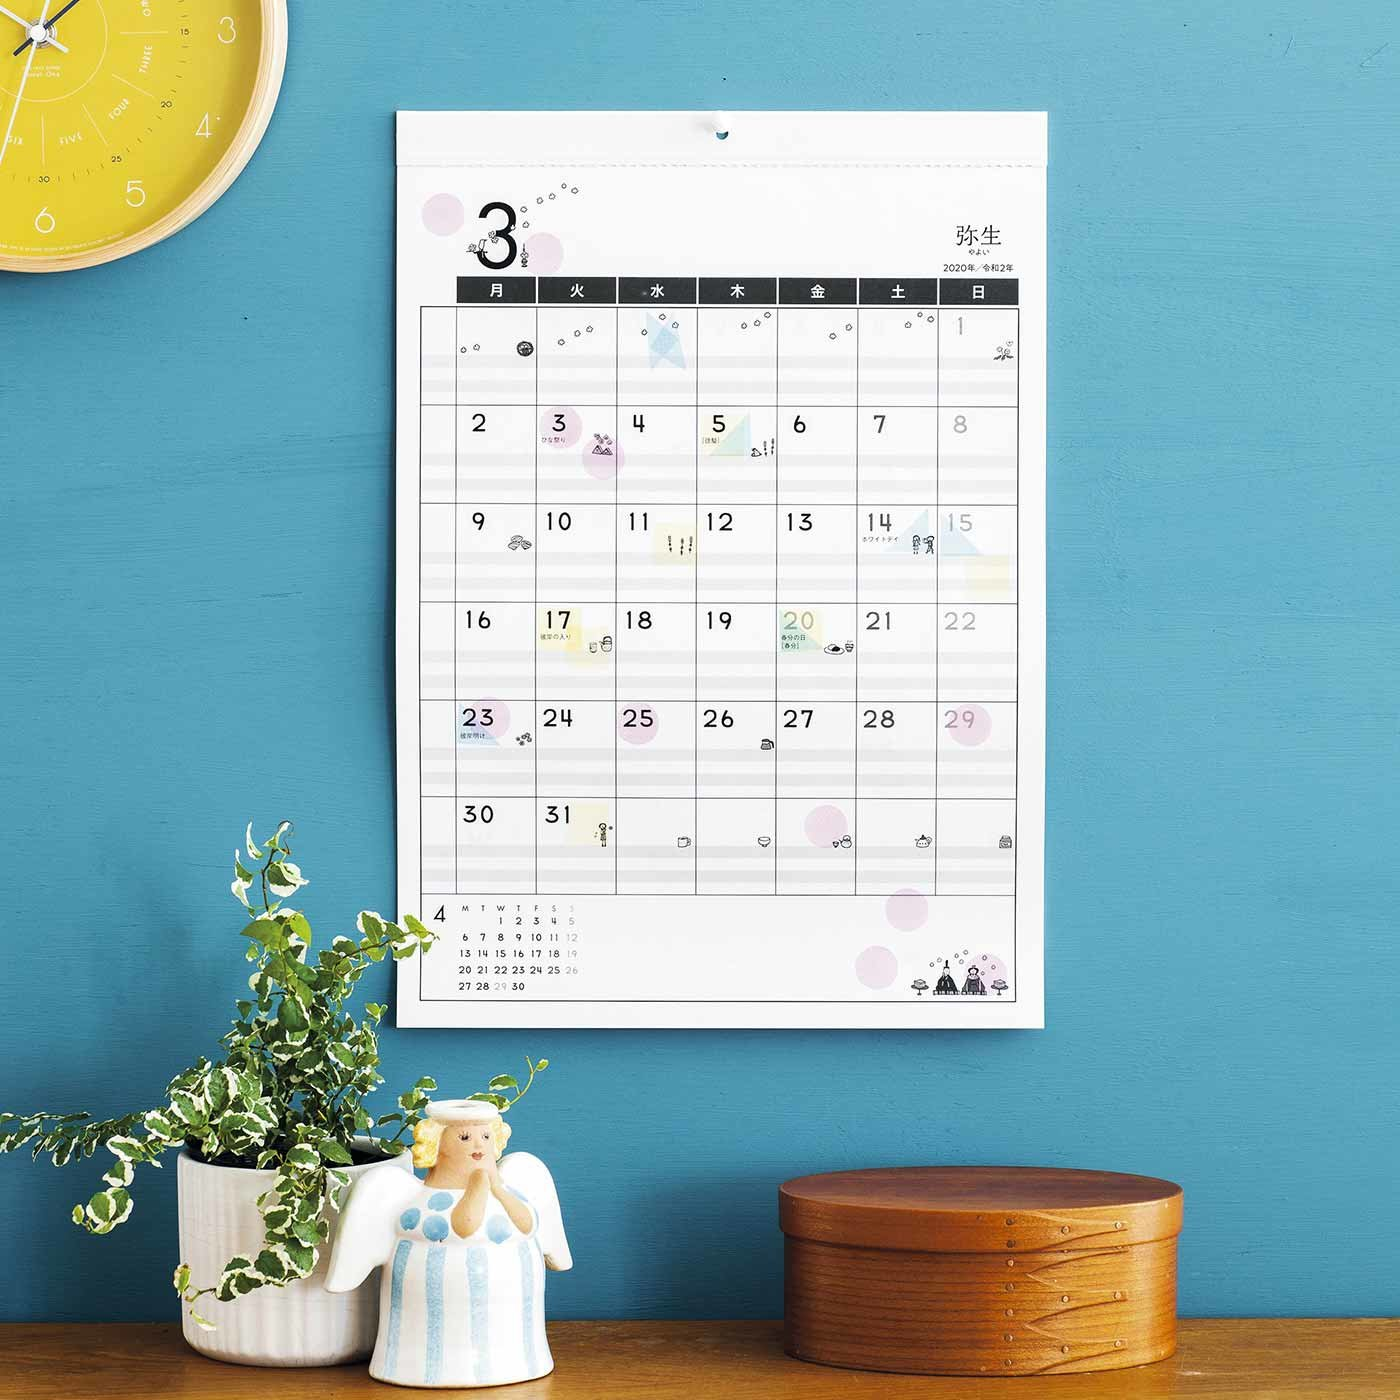 SF STUDIO みんなのスケジュール共有★ ウォールカレンダー